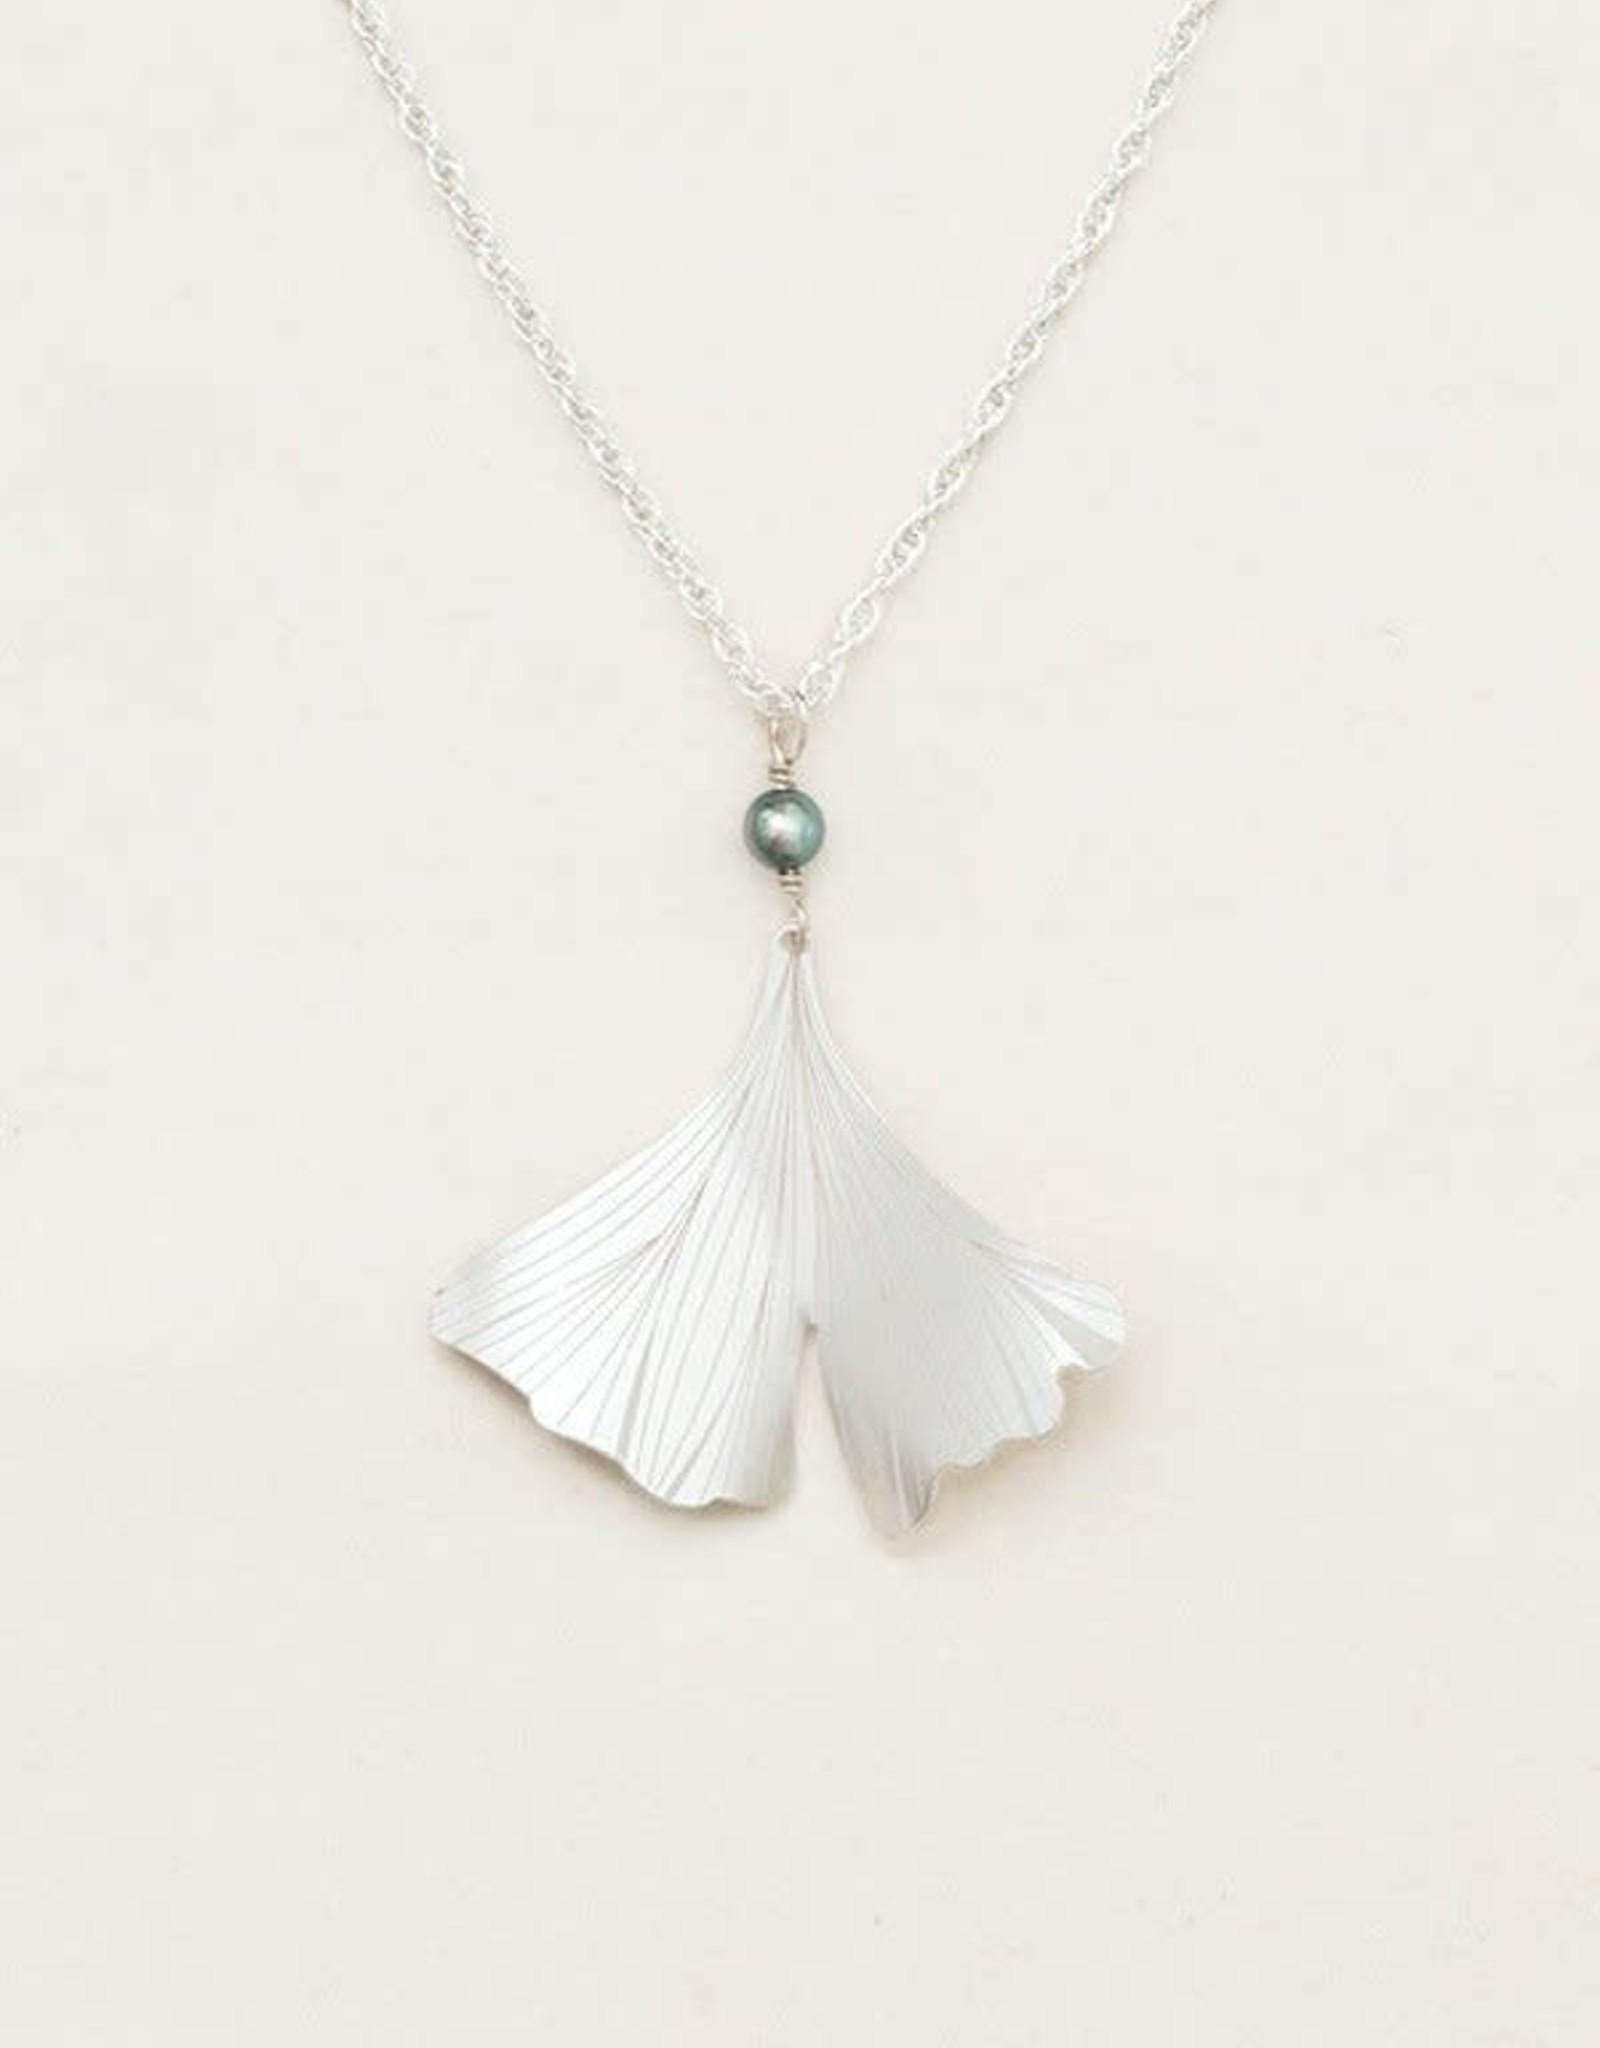 Holly Yashi Silver Ginkgo Pendant Necklace